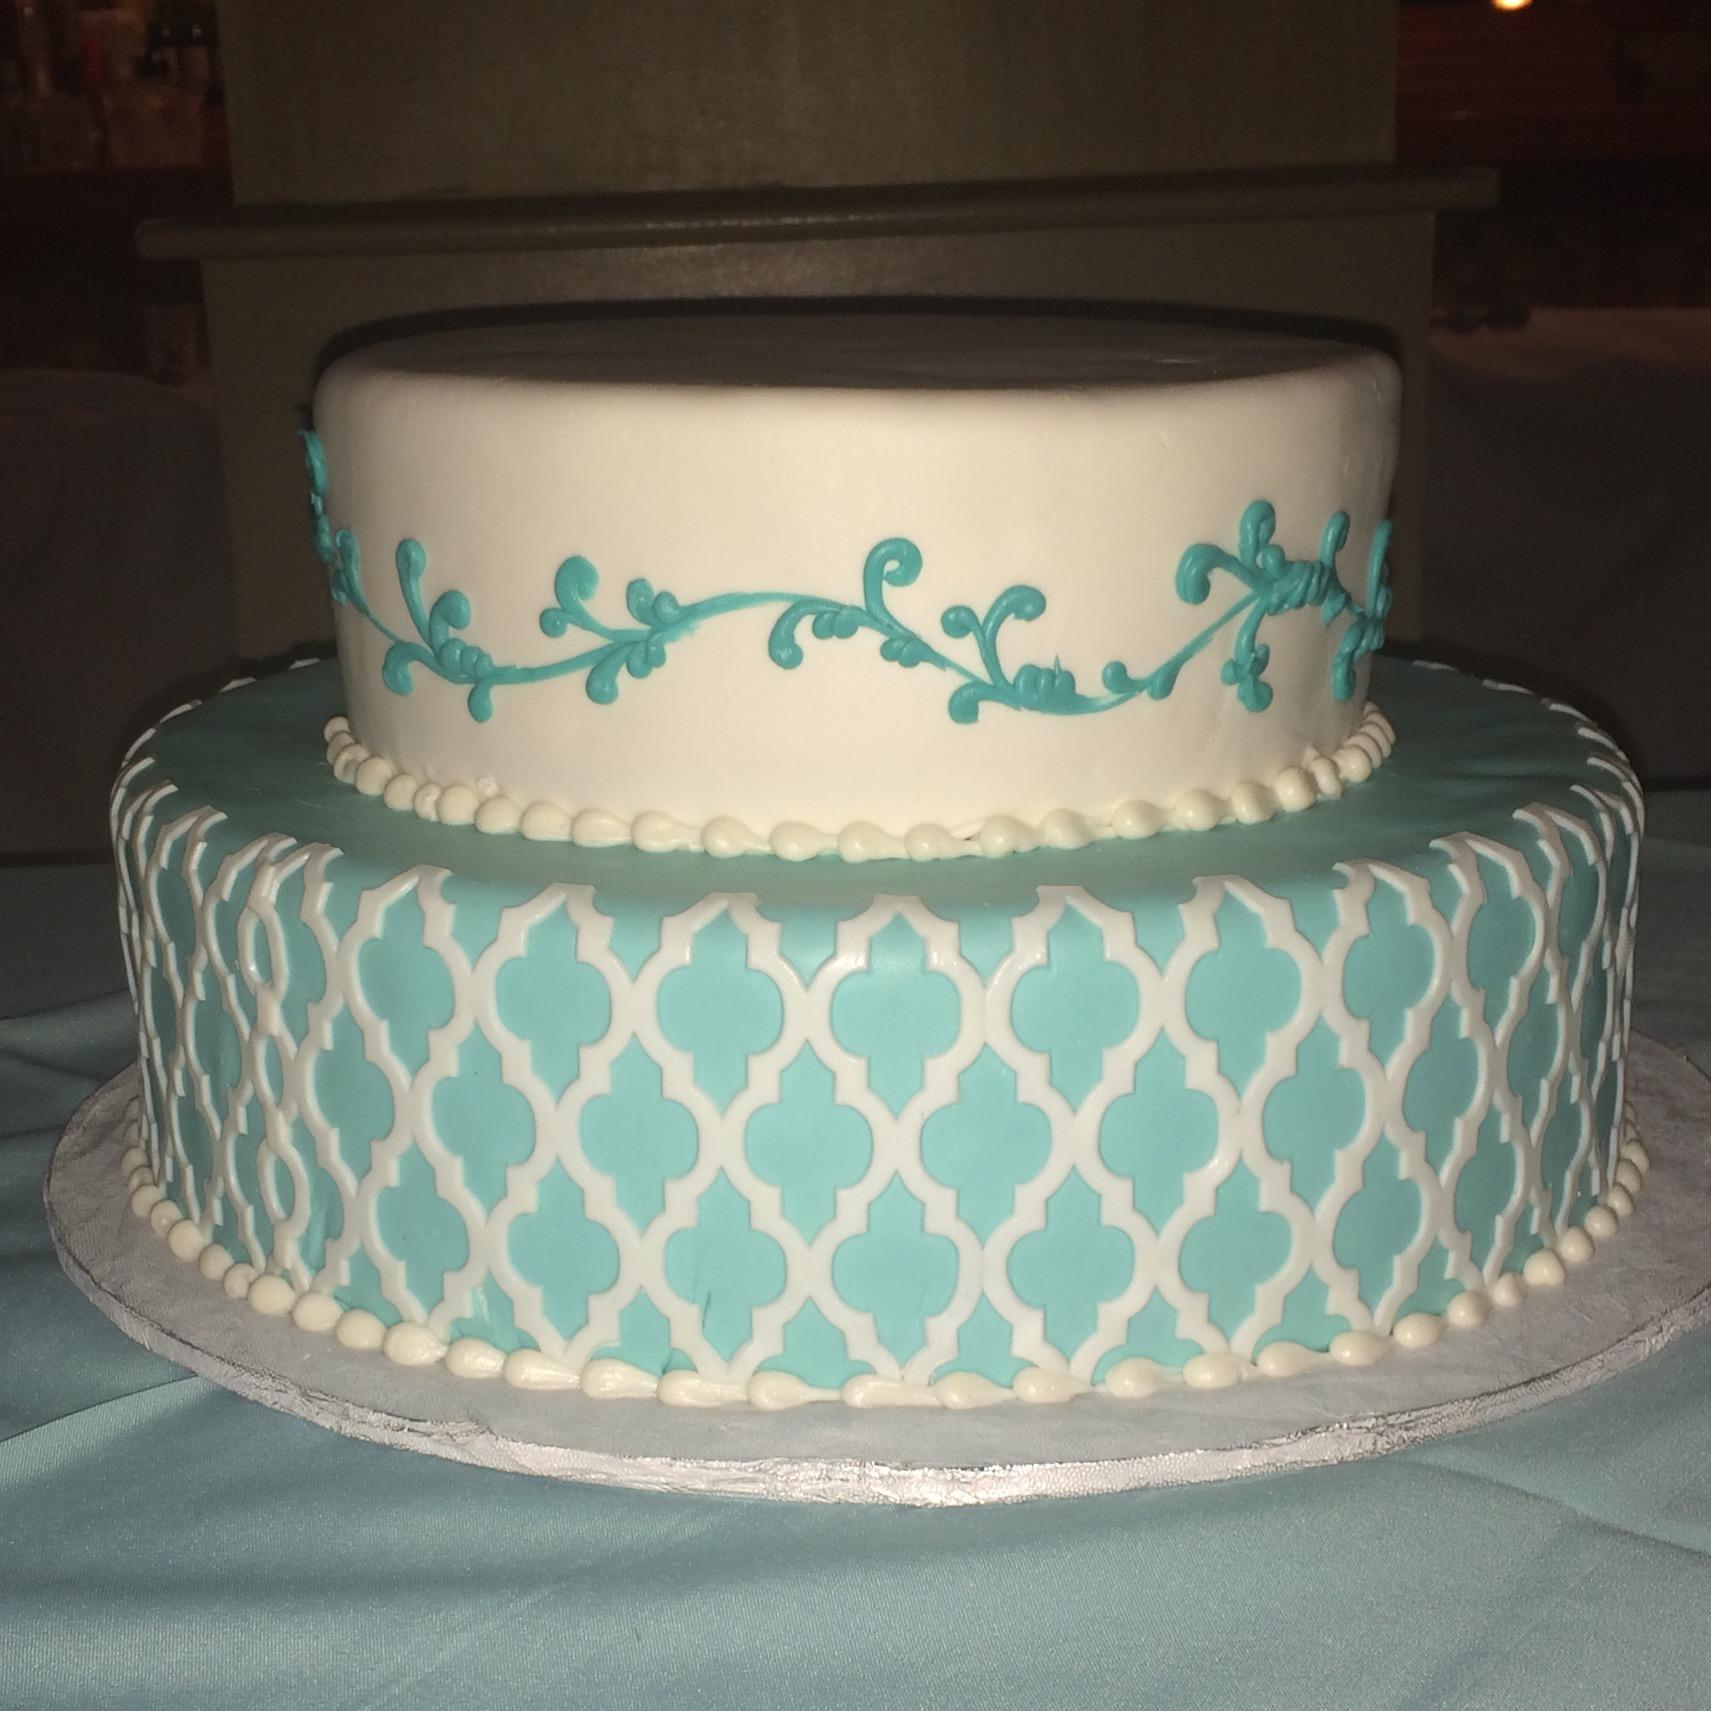 Tiffany Blue rolled fondant white Morrocan overlay. White Rolled Fondant Tiffany scroll work.jpg